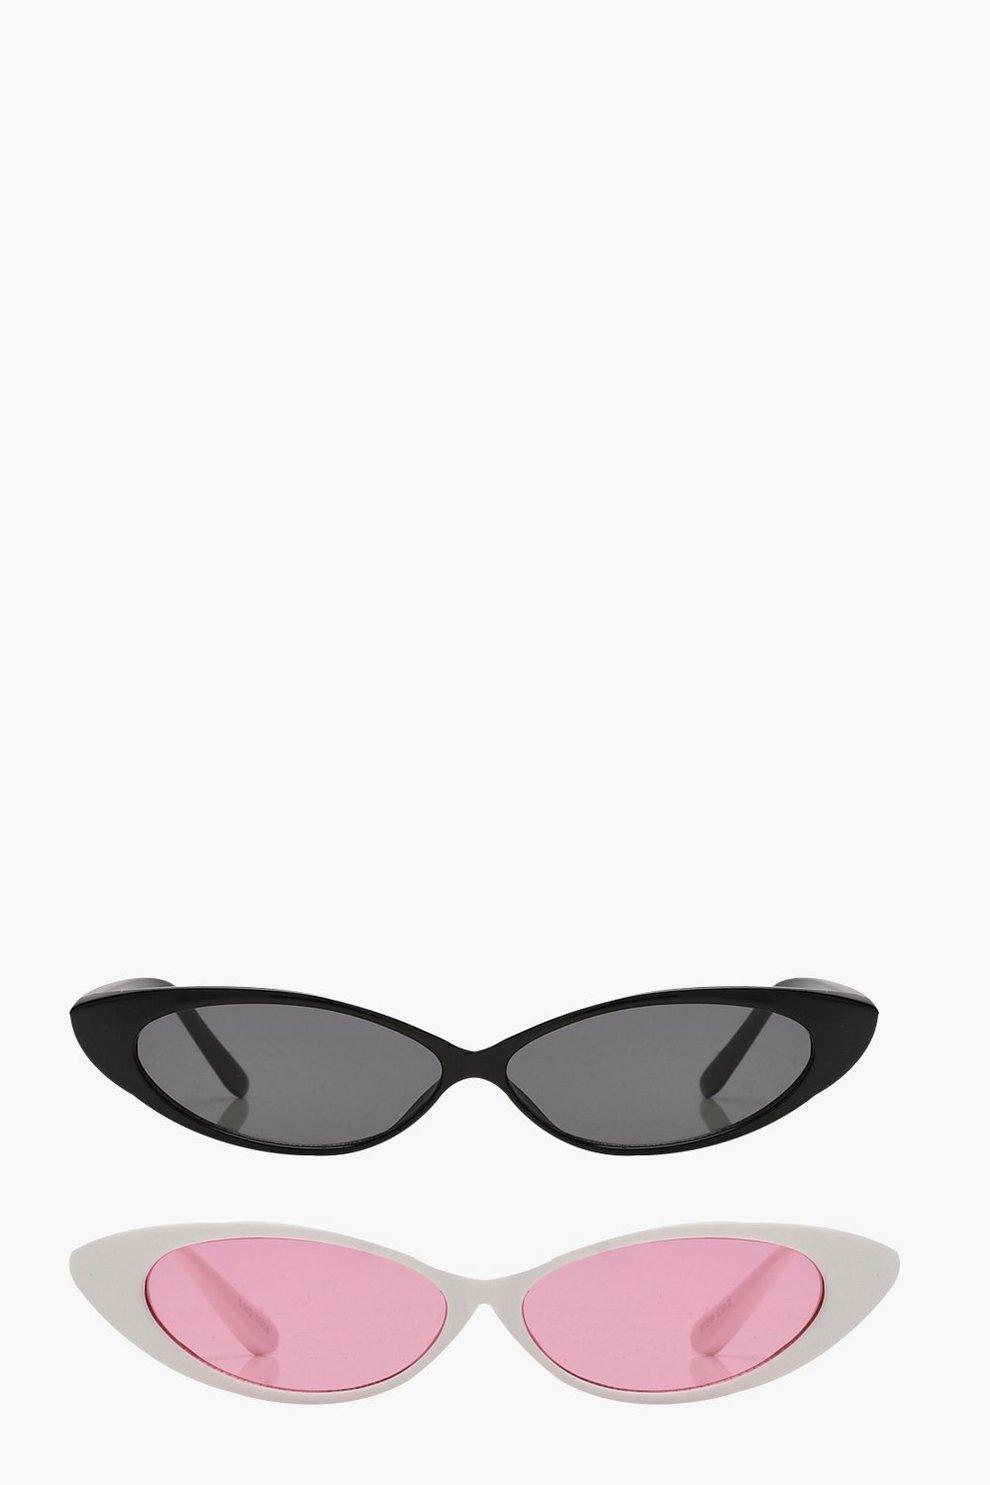 d7fc51fc700 2 Pack Super Slim Cat Eye Sunglasses